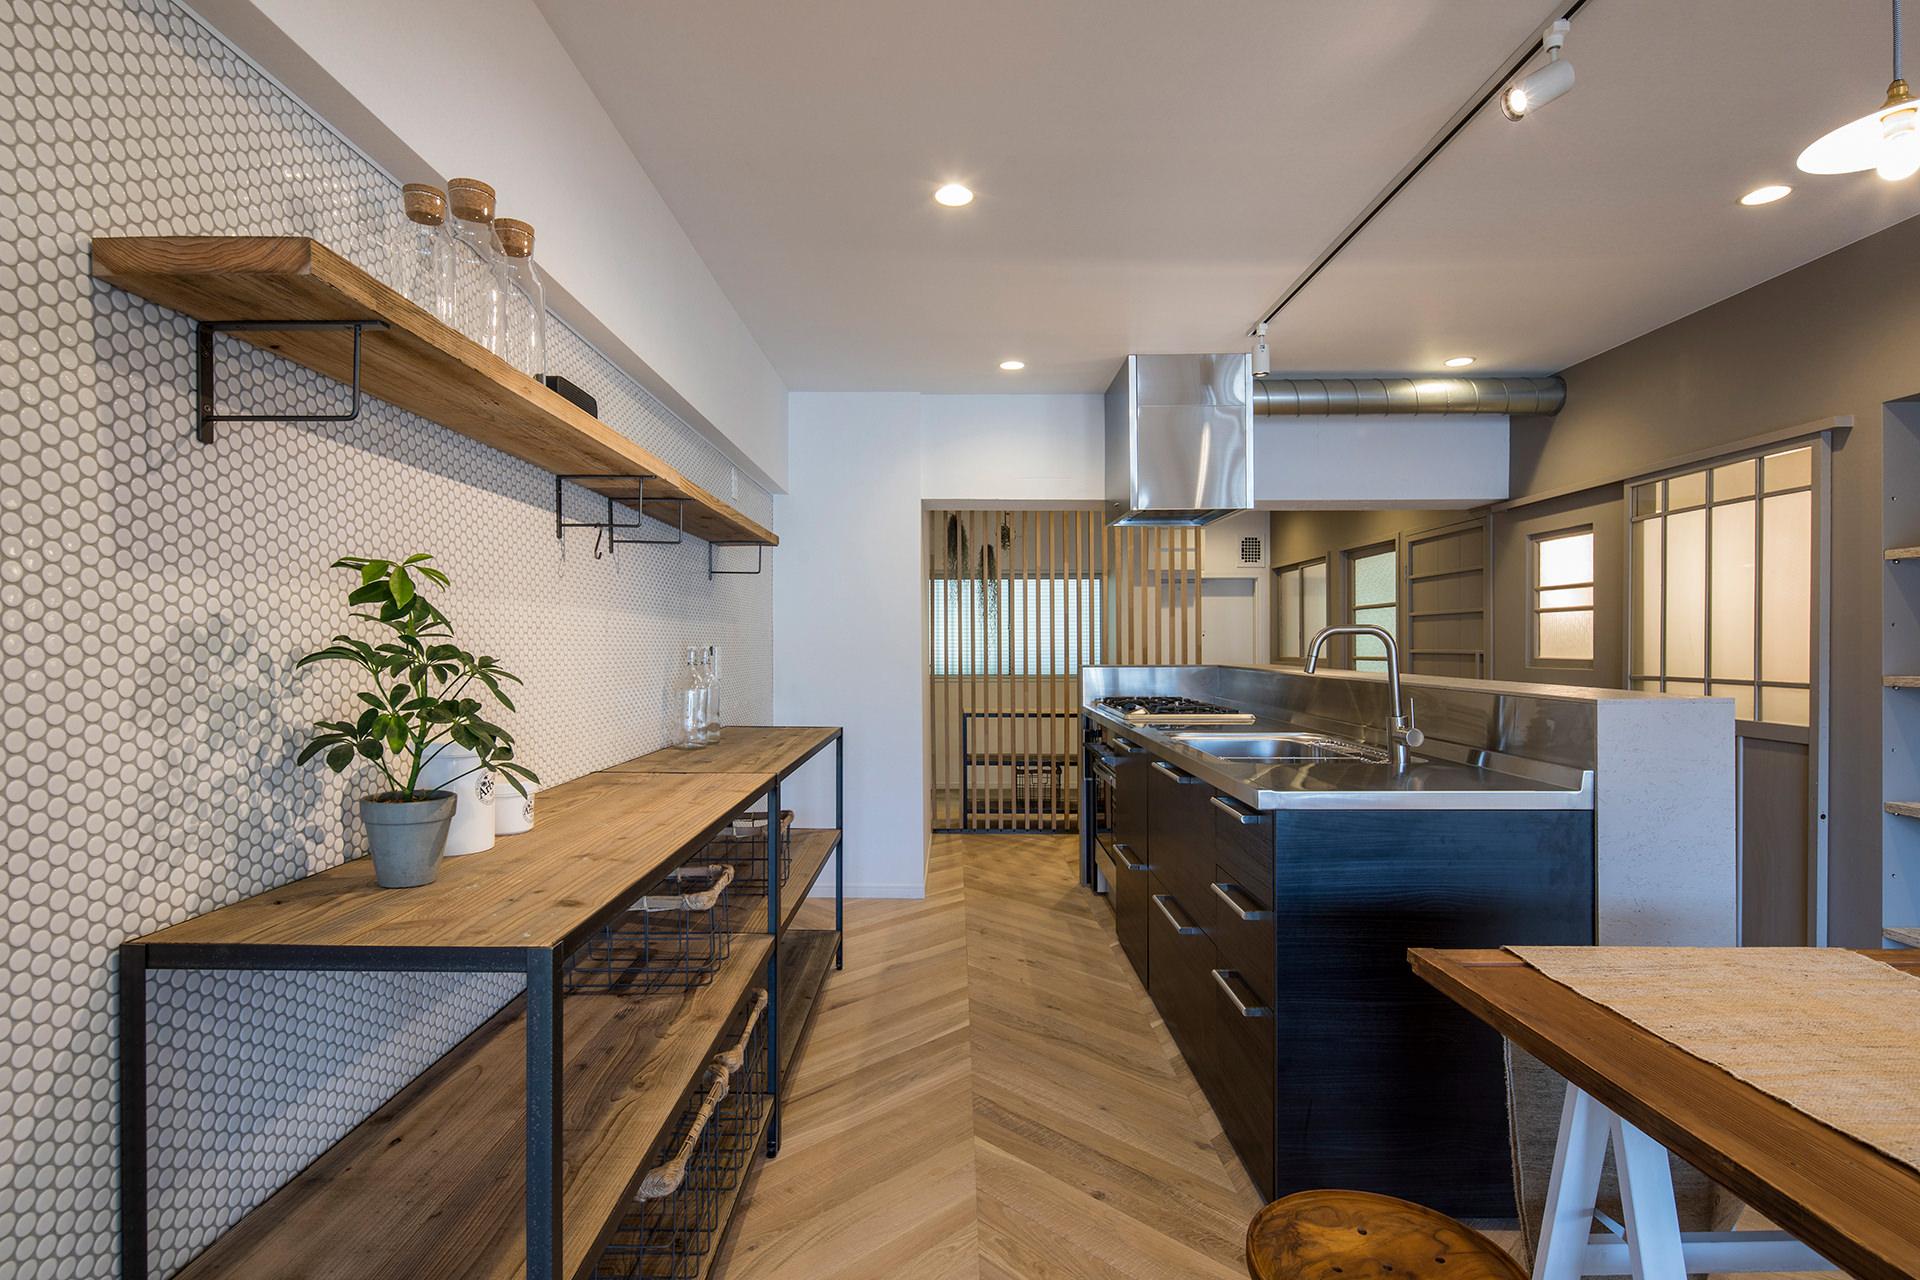 stri-ep house* flat 葉山エコーハイツ  イメージ12 撮影:東涌写真事務所・東涌宏和